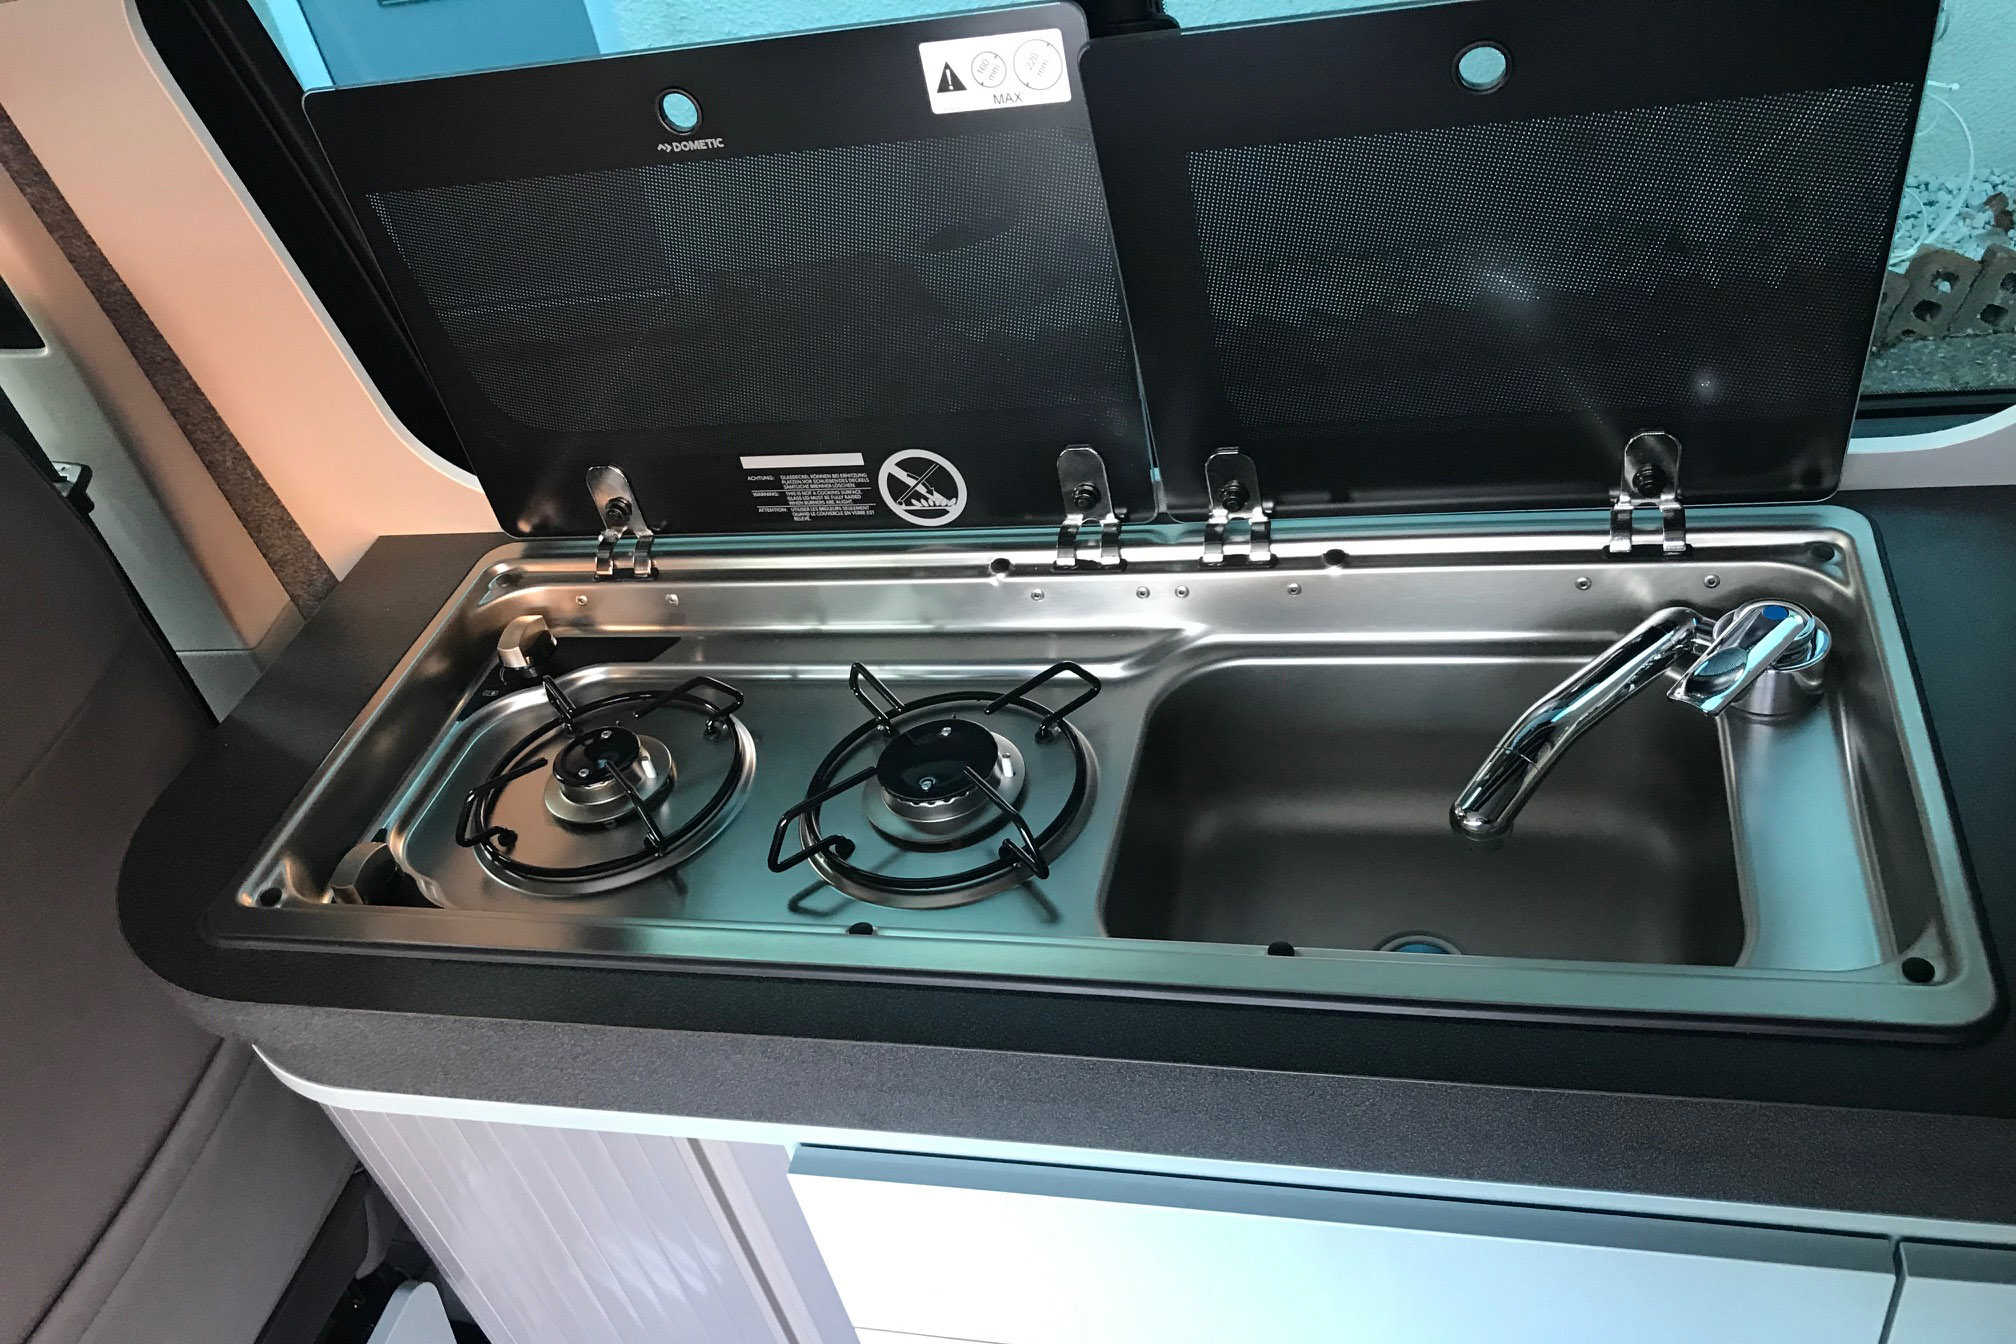 vwcampervan_t6_cooker&sink1344